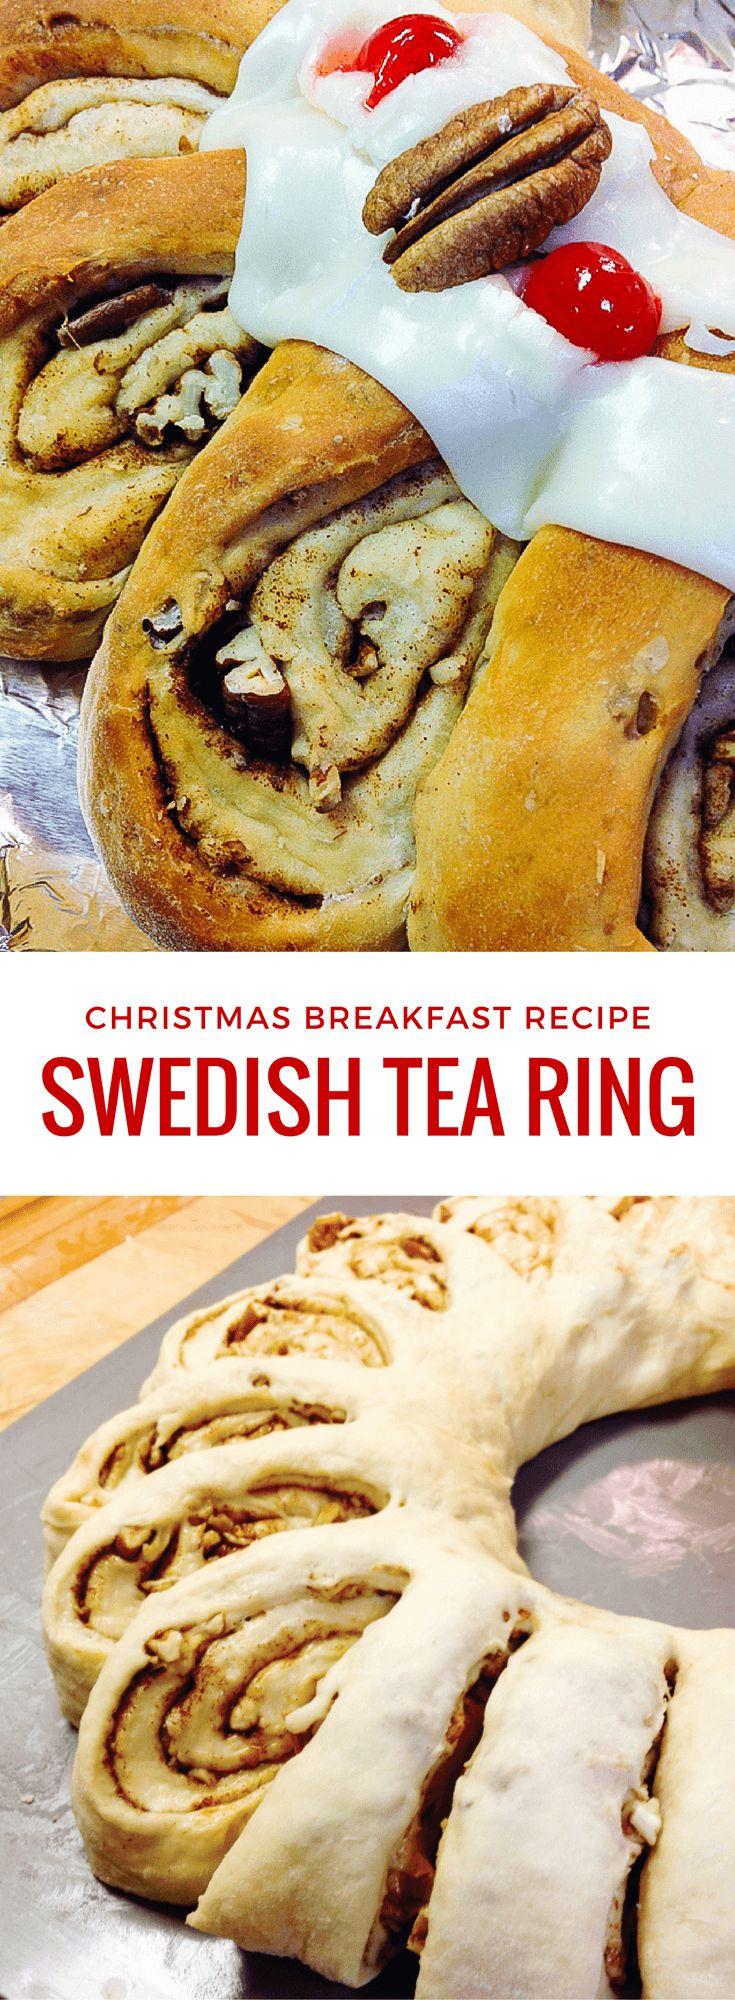 Swedish Tea Ring Recipe - special and memorable Christmas Breakfast idea | #breakfastrecipe #christmasbreakfast #christmas #breakfast #christmastraditions